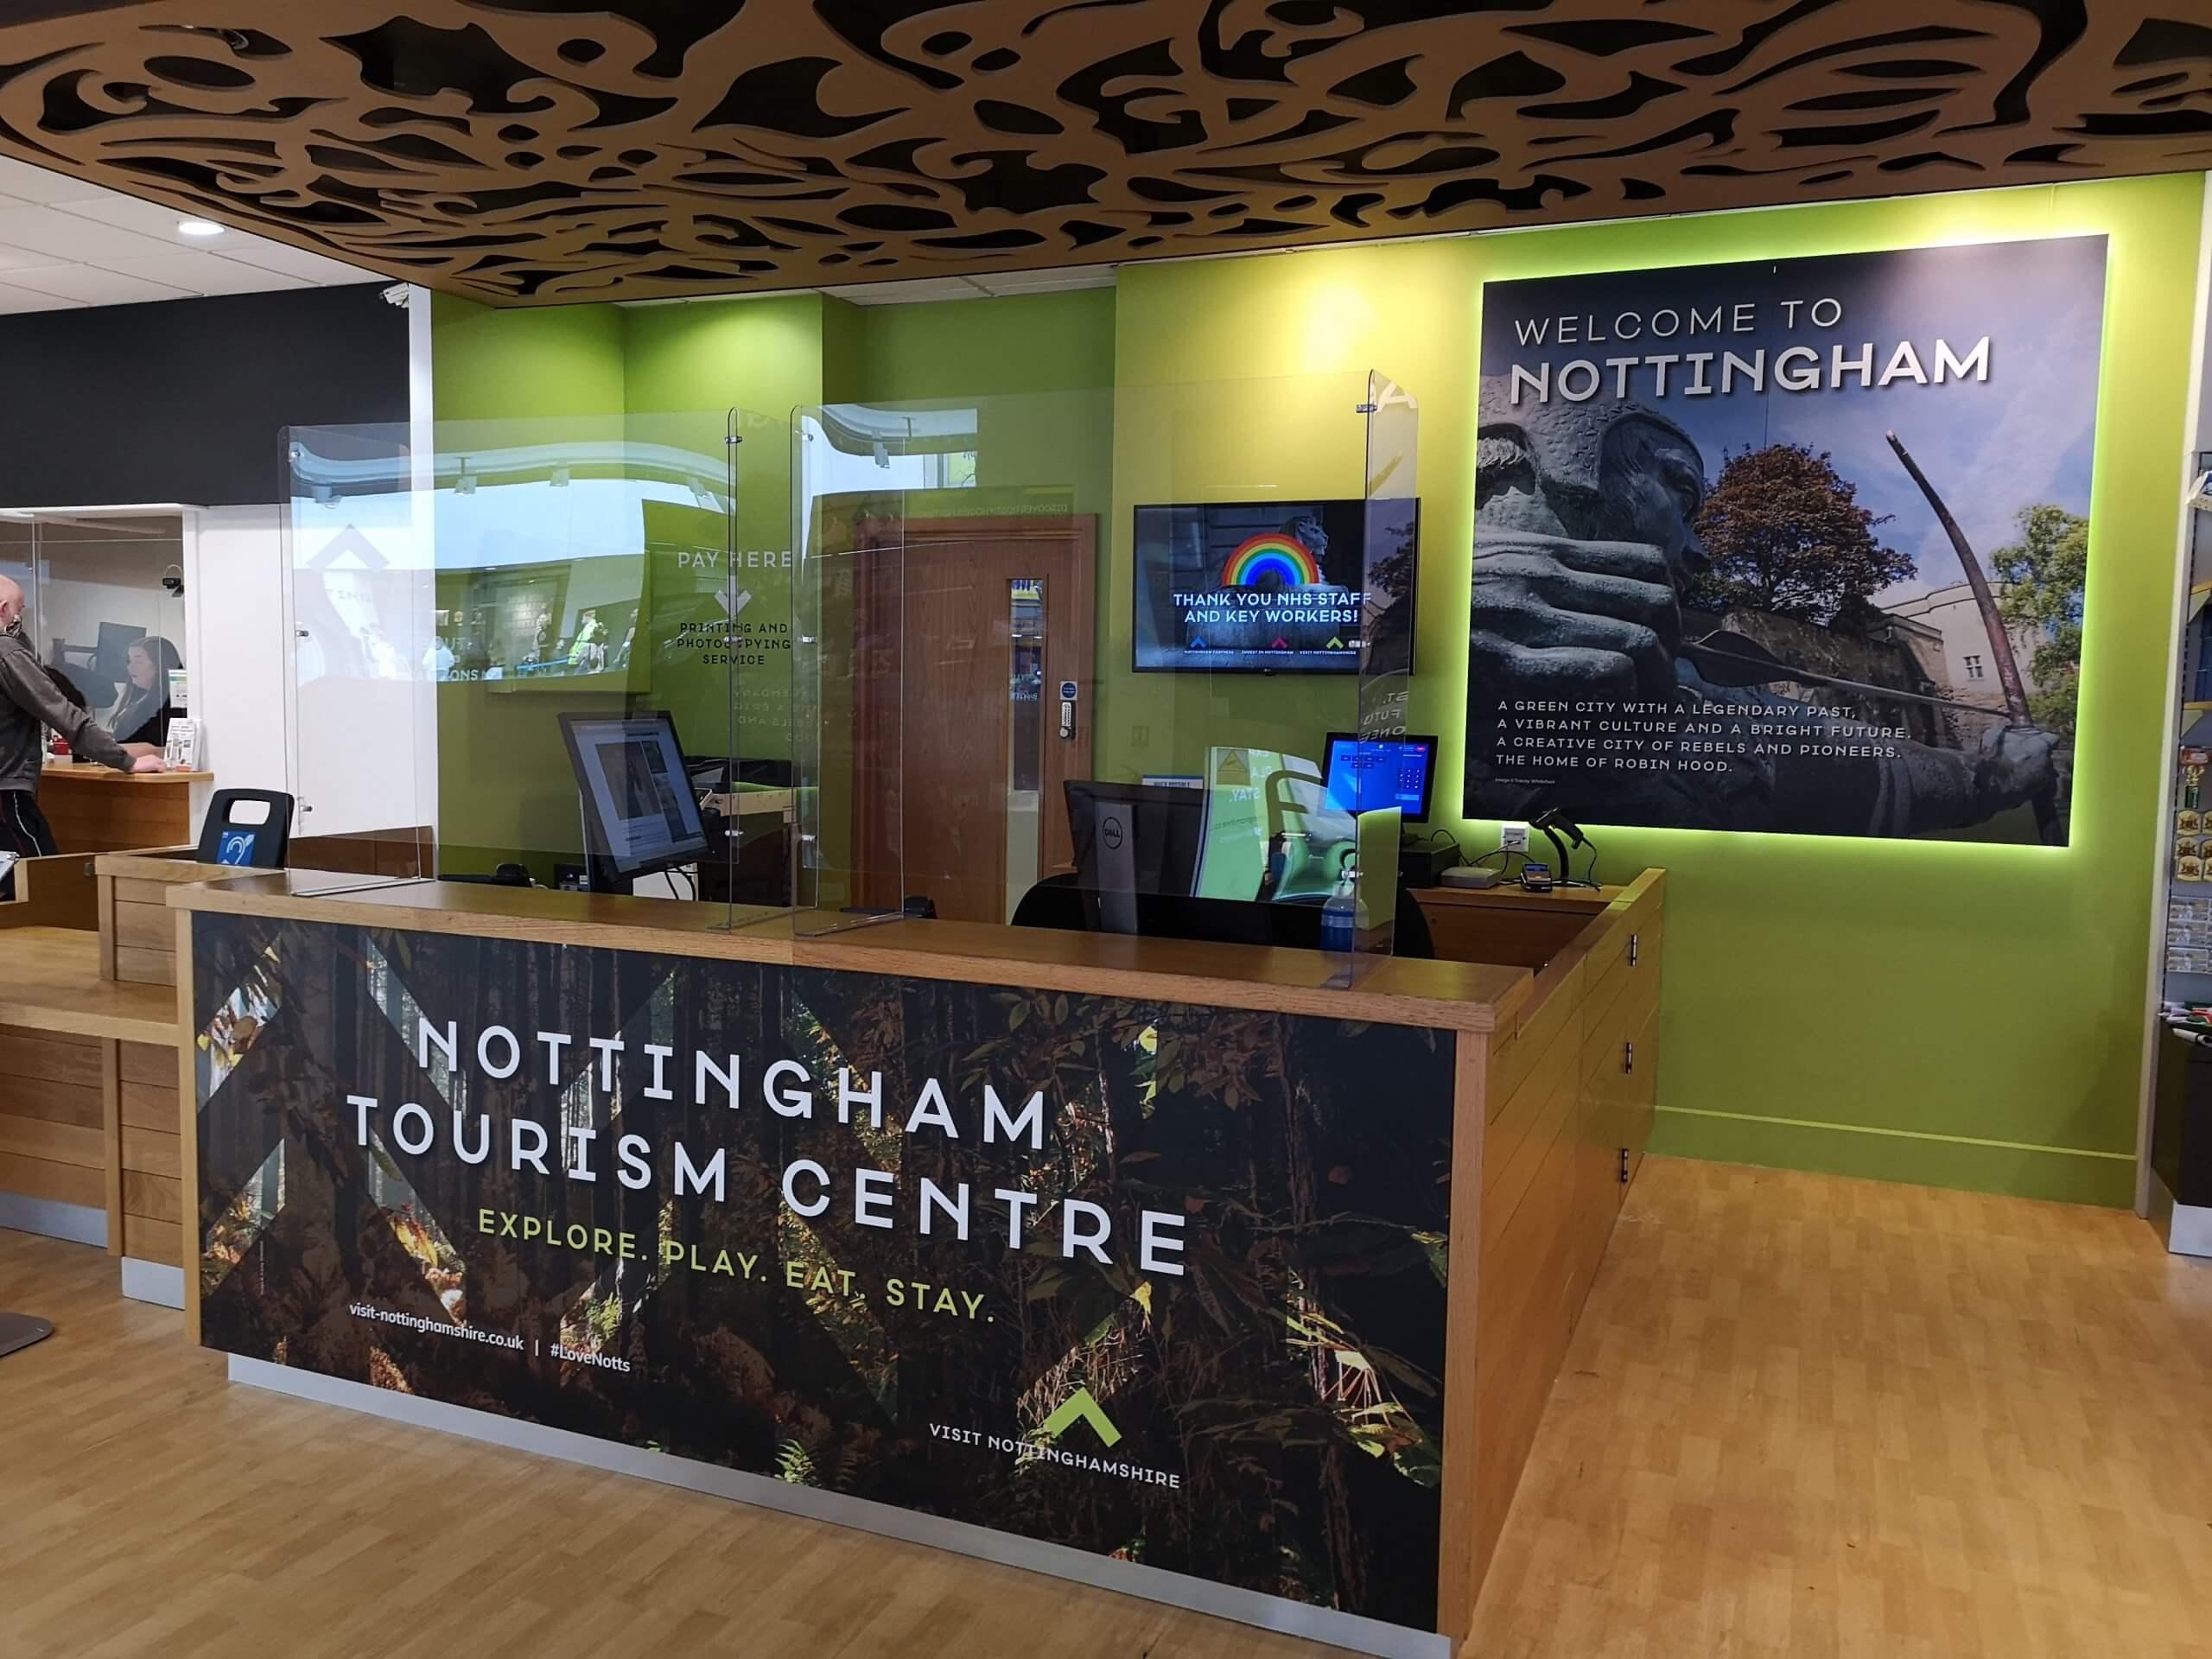 Nottingham Tourism and Travel Centre